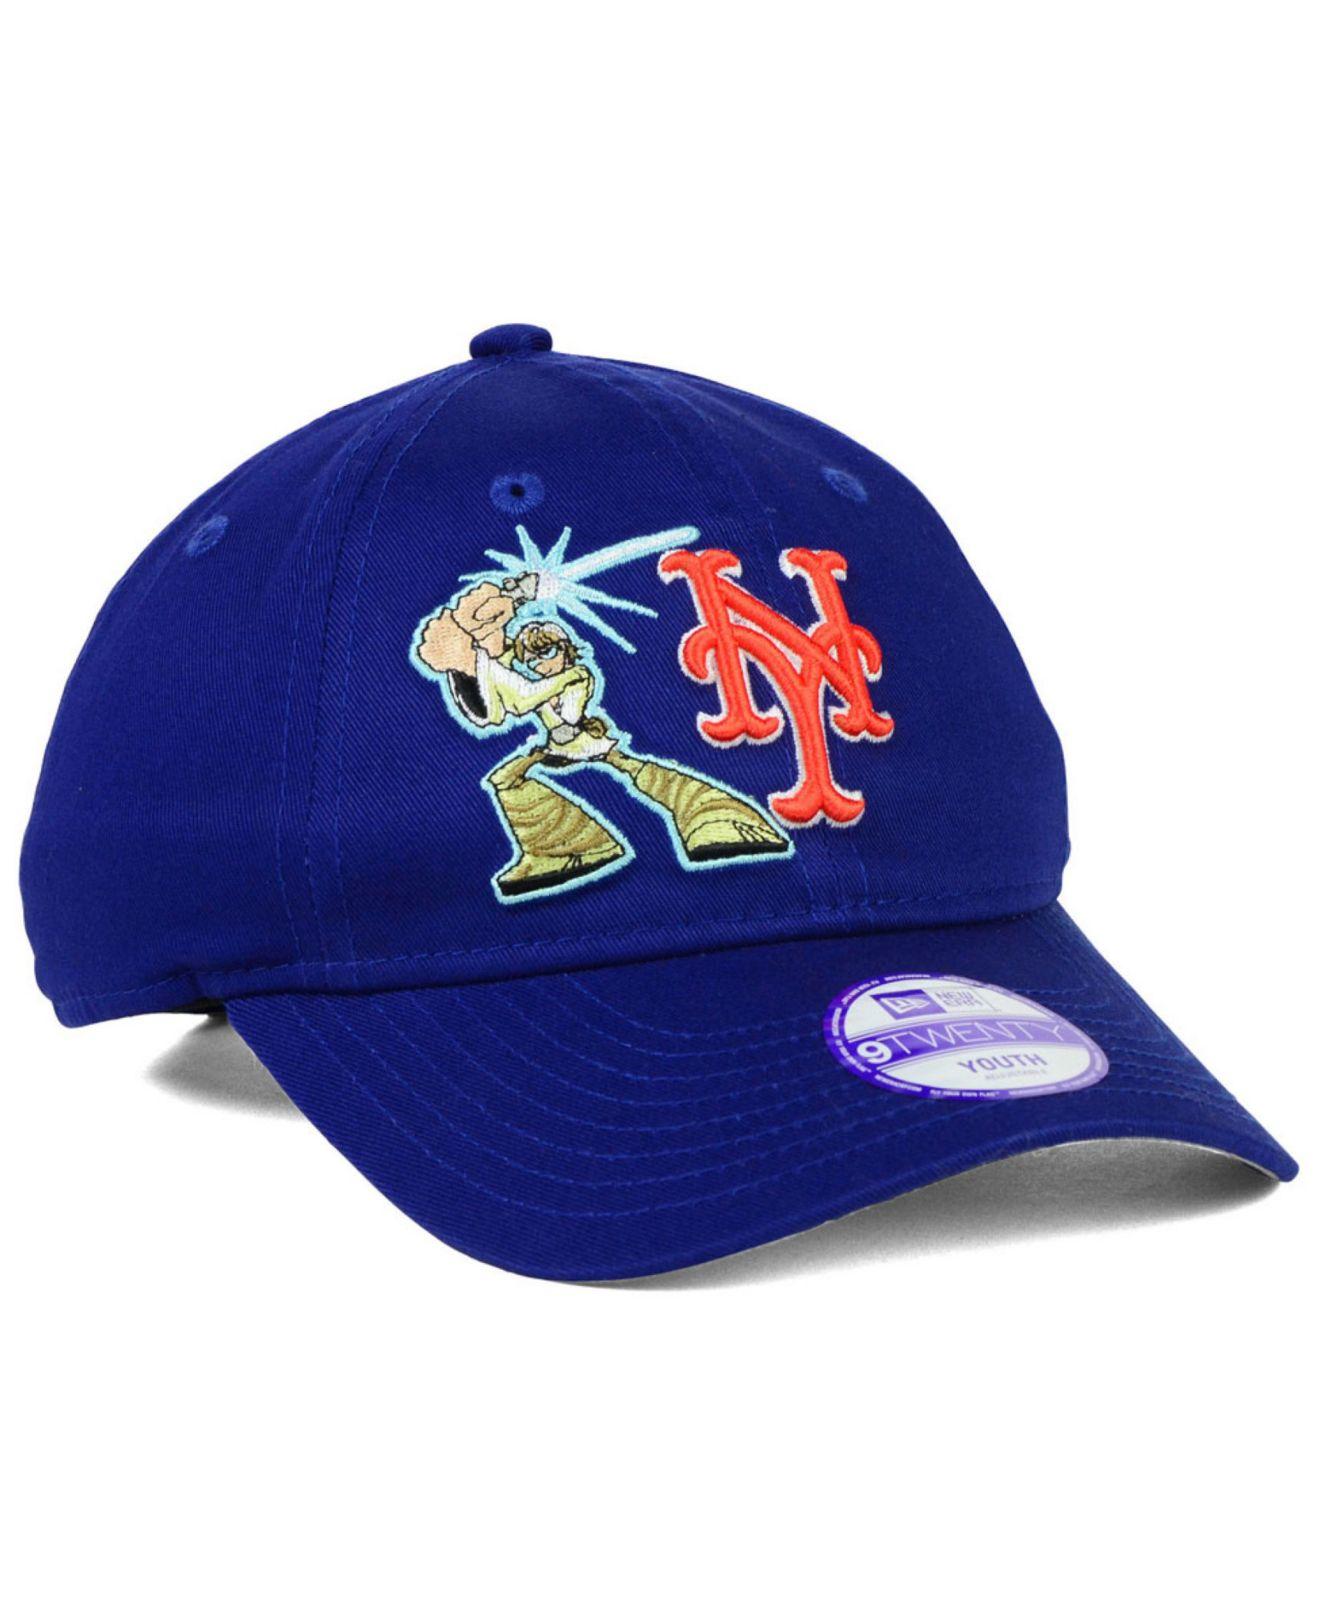 promo code 1475c 3f338 ... adjustable ff238 23161  authentic lyst ktz kids new york mets star wars  9twenty cap in blue for men d9f58